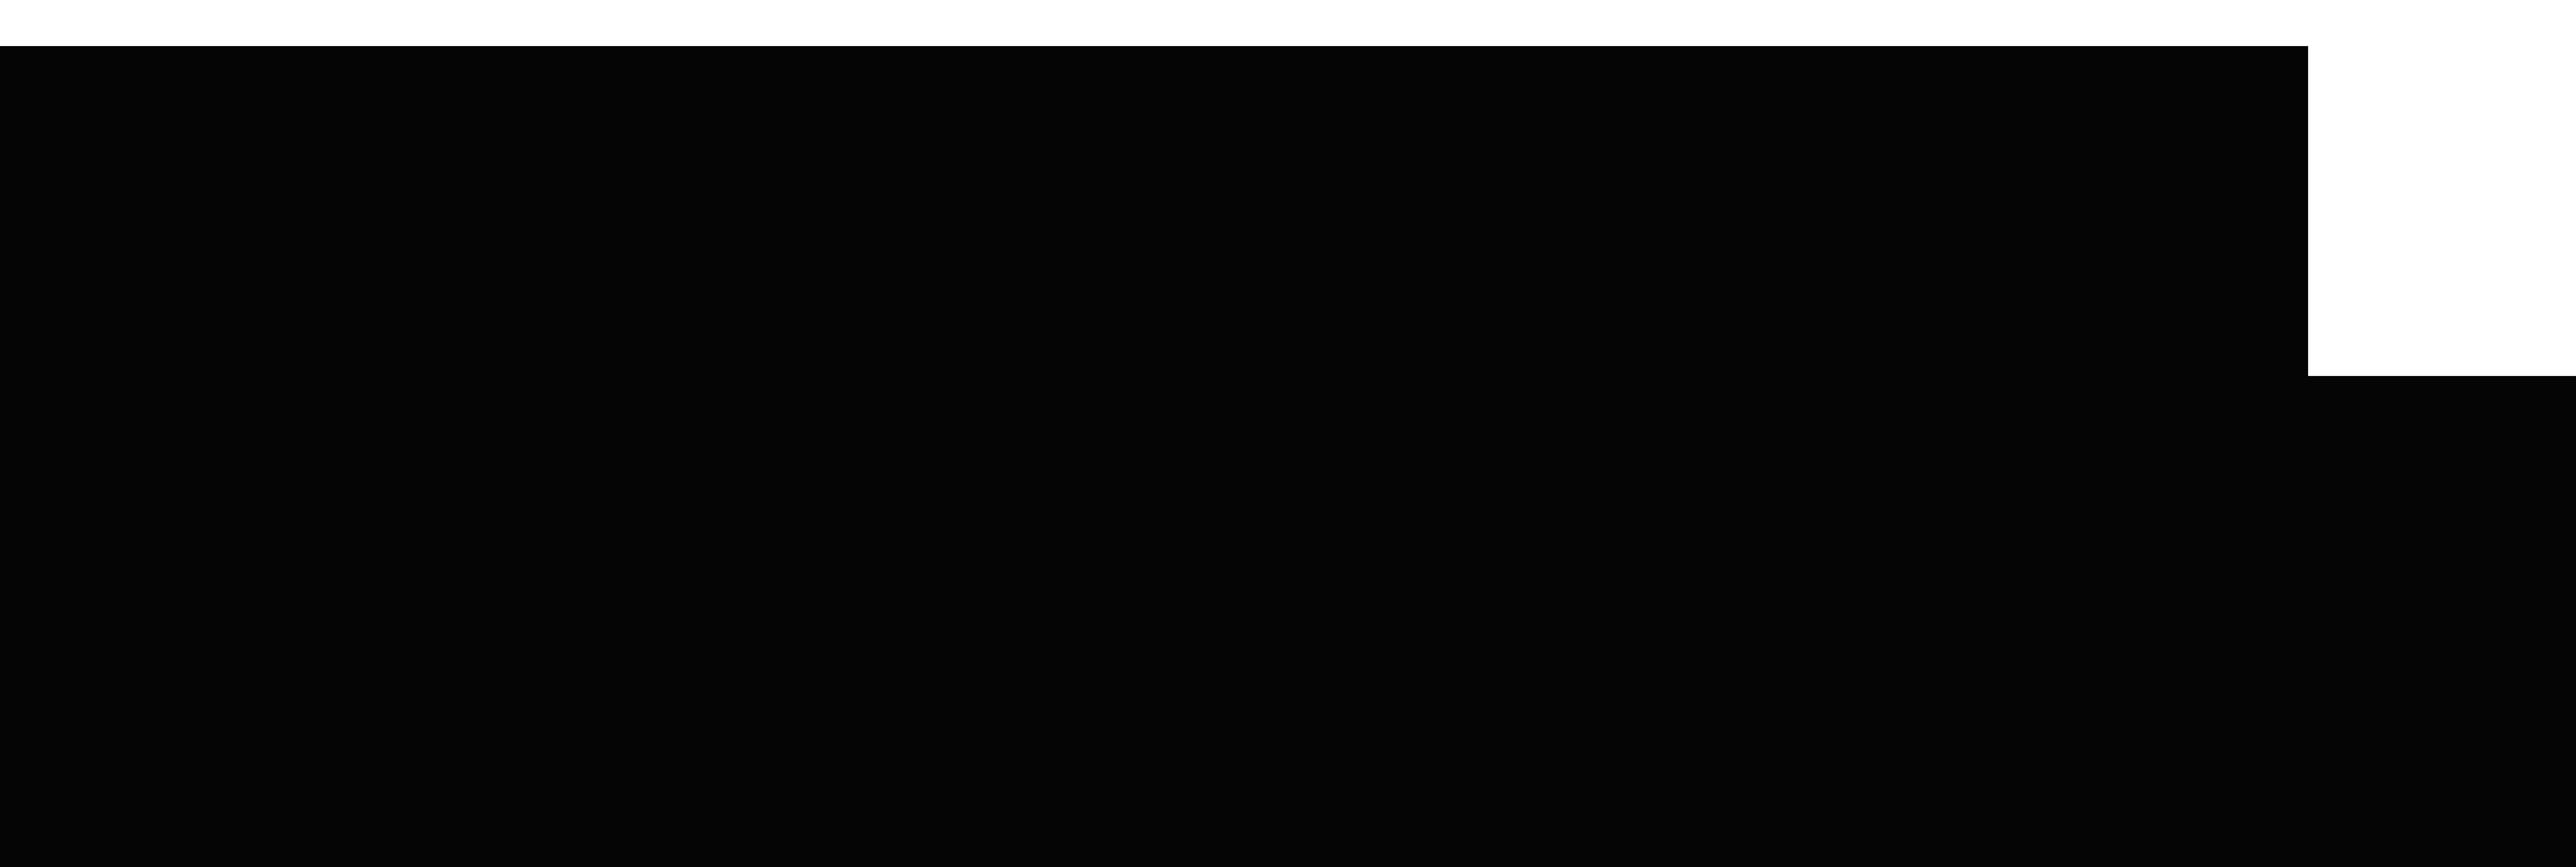 Cityscape silhouette clip art. Hammer clipart prototype